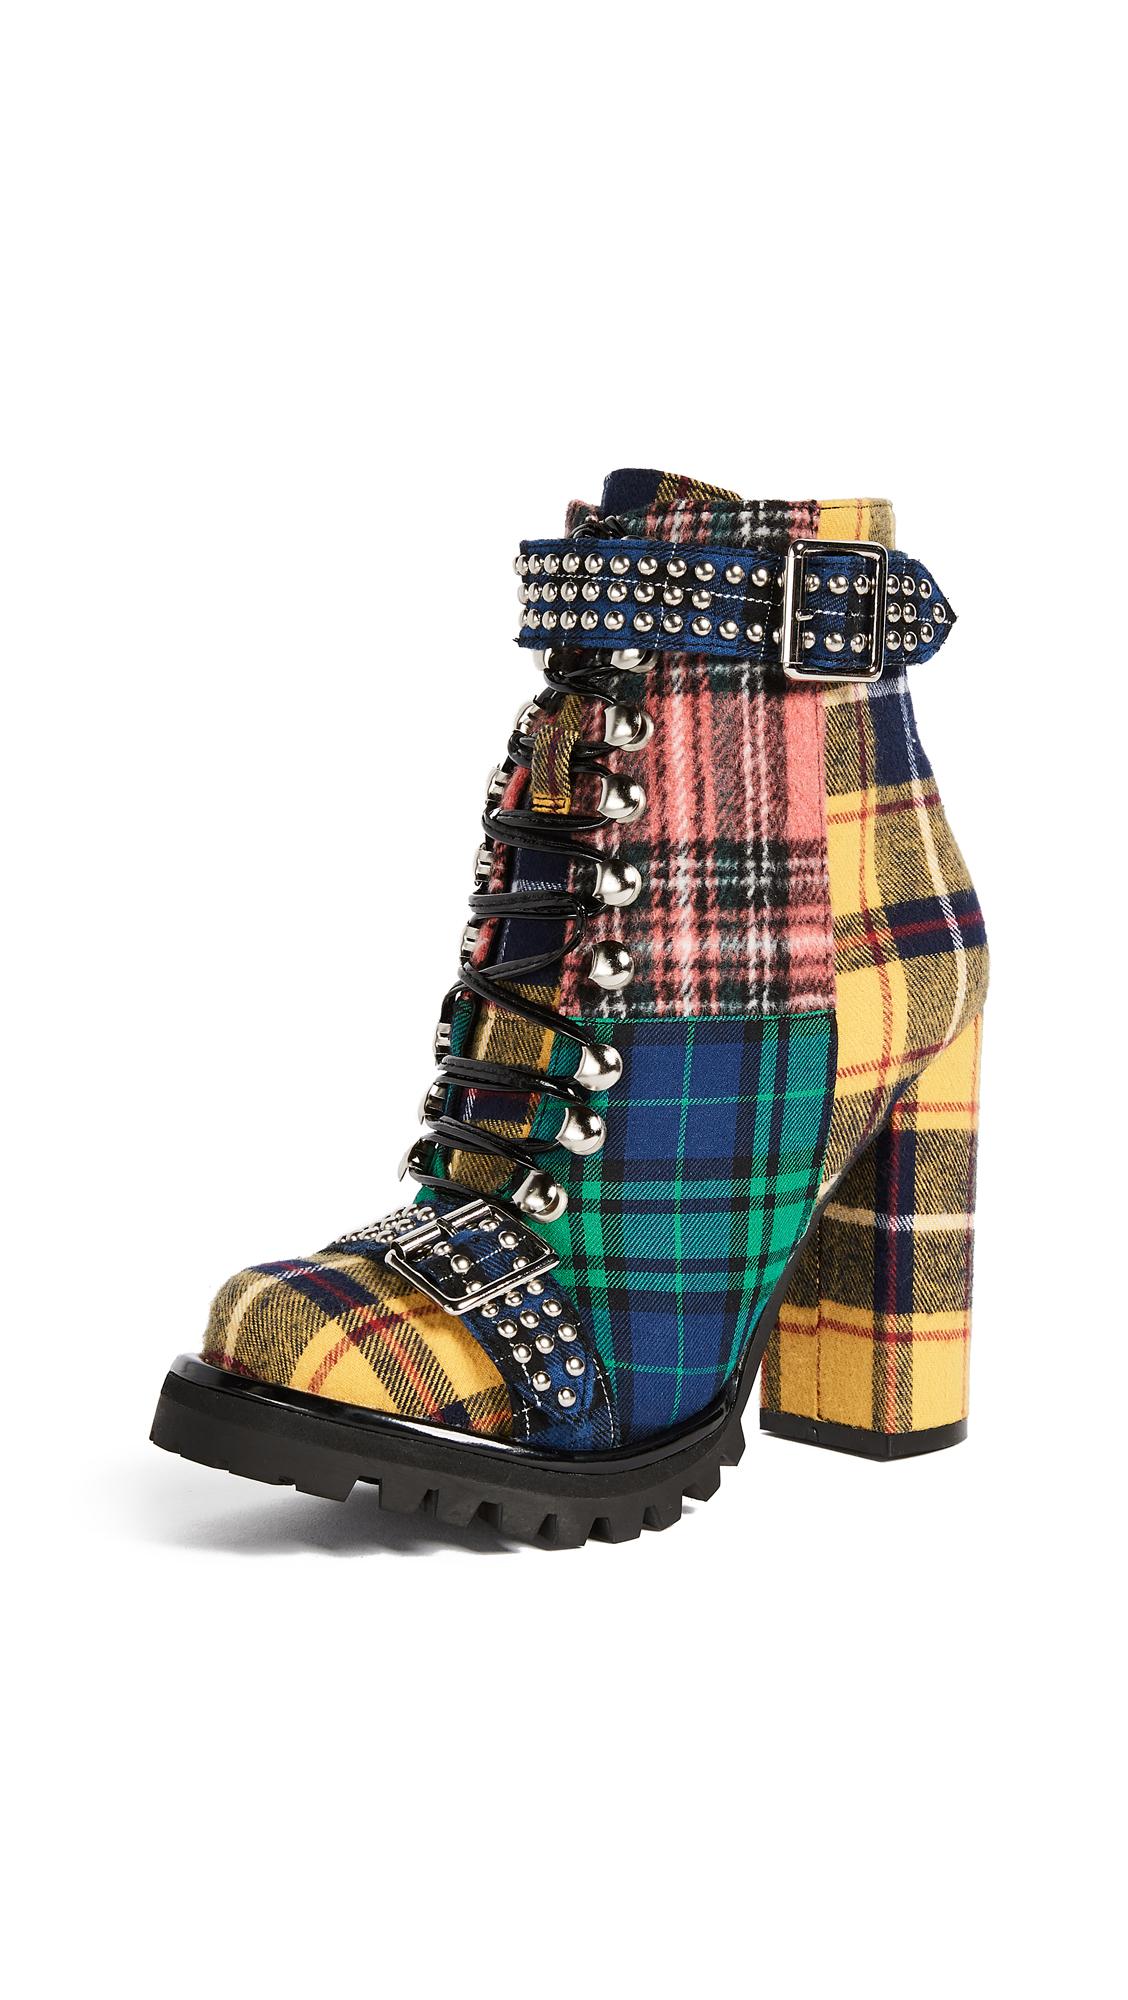 Jeffrey Campbell Lilith Block Heel Boots - Yellow/Green